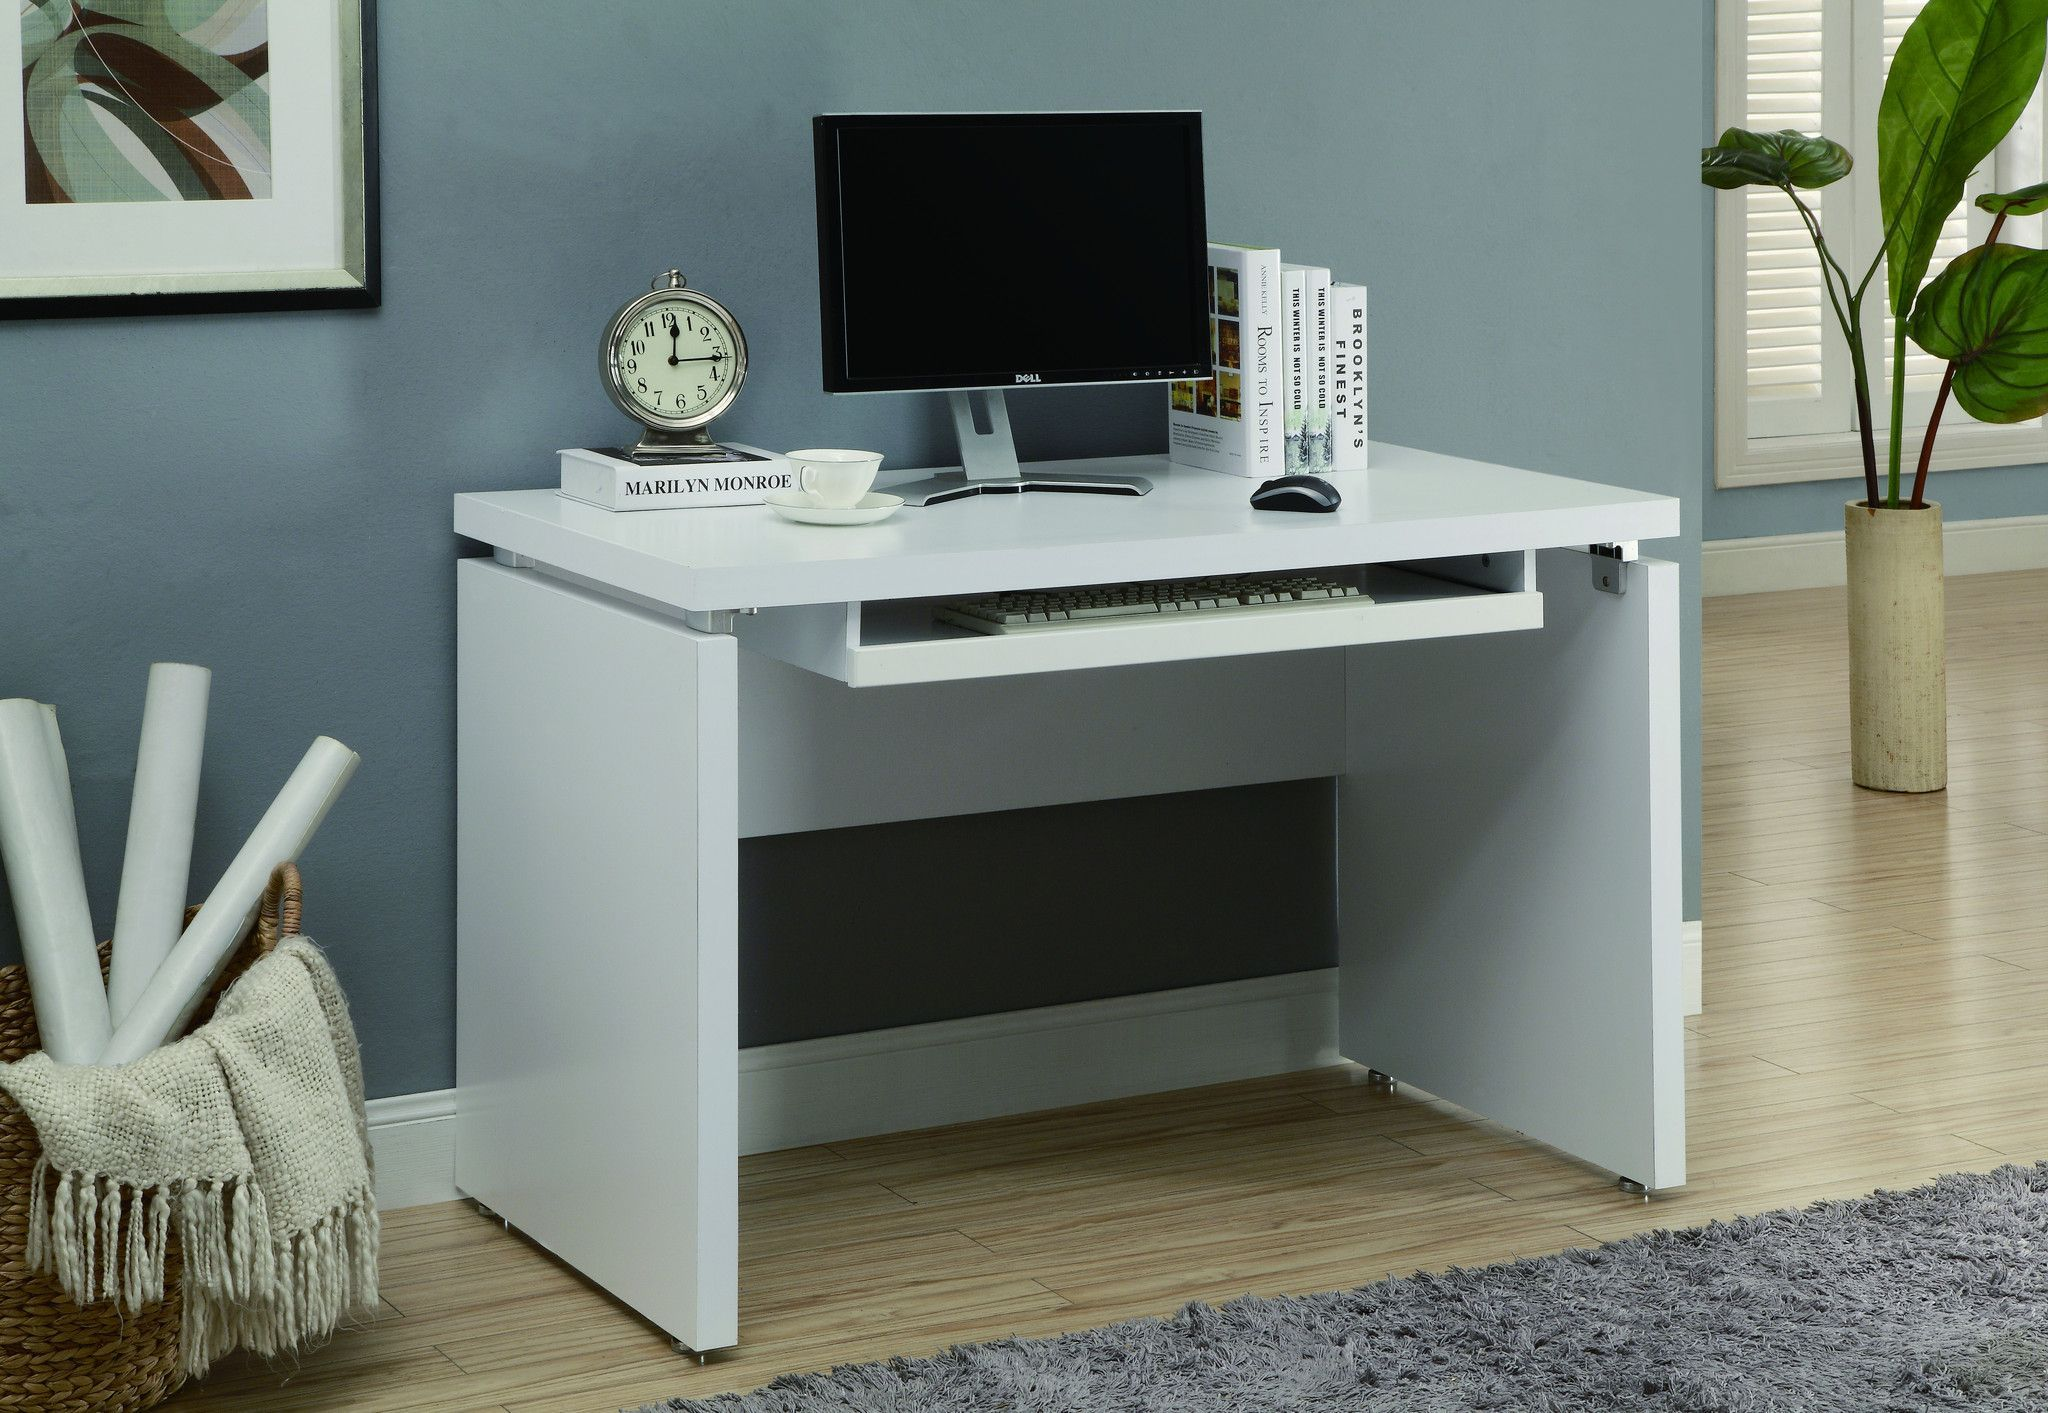 48 Modern White Computer Desk With Floating Top Keyboard Tray White Computer Desk White Desk Office Desk